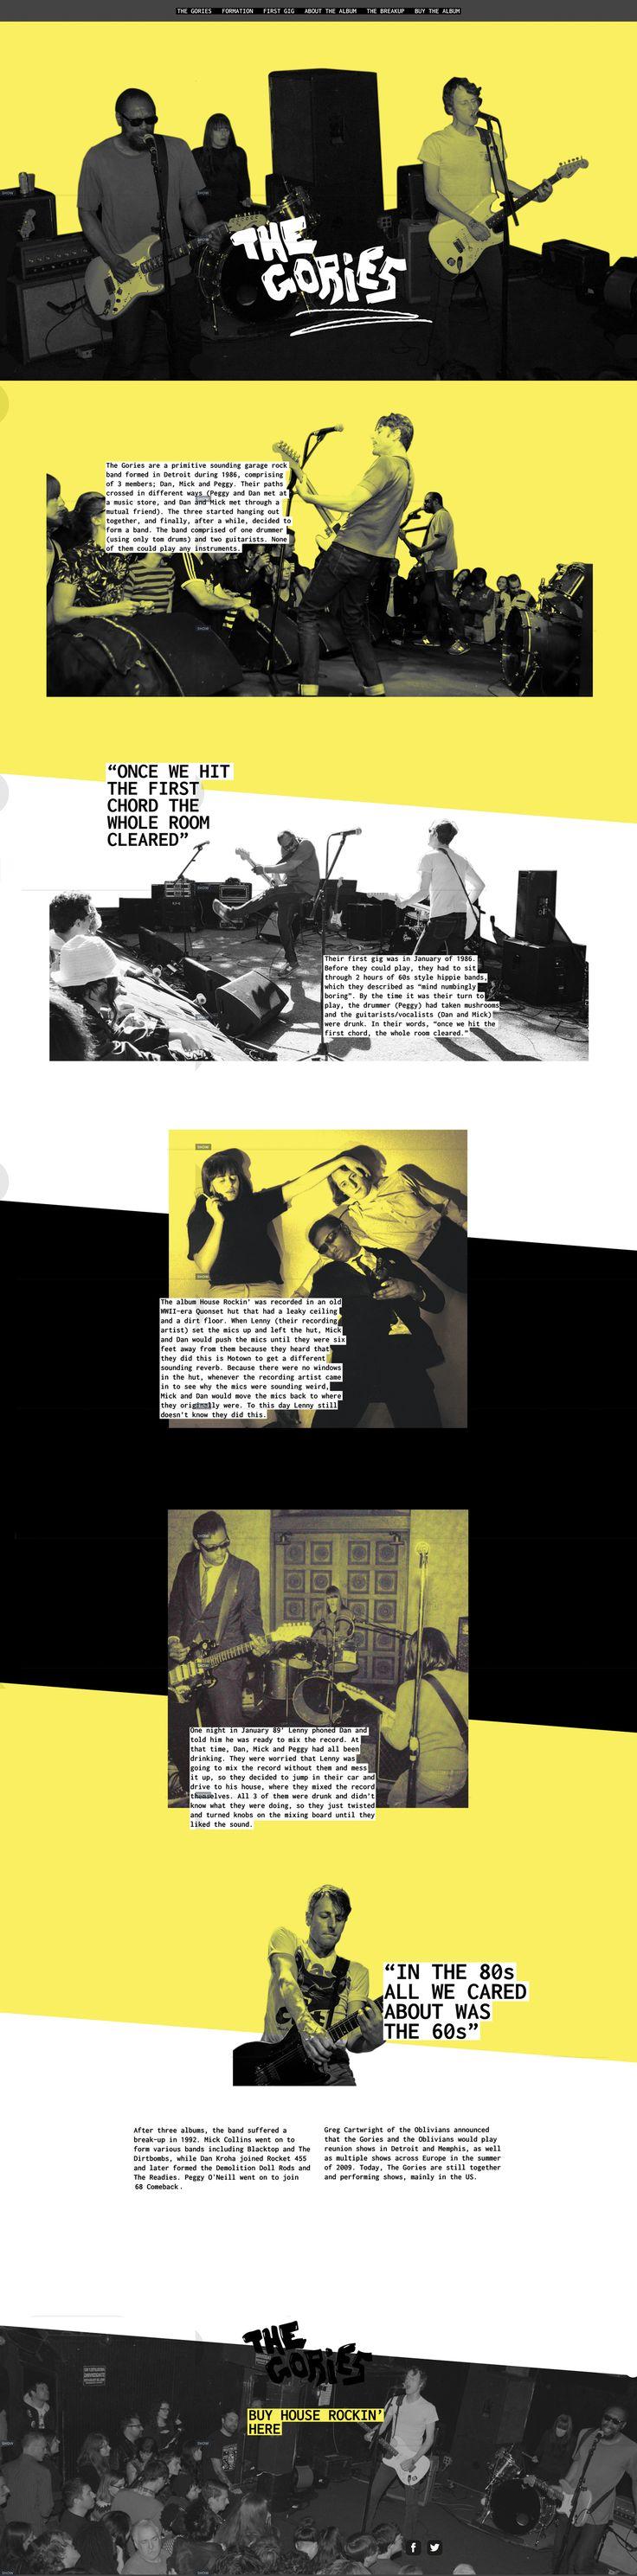 Ewan Morris / The Gories / one page web design